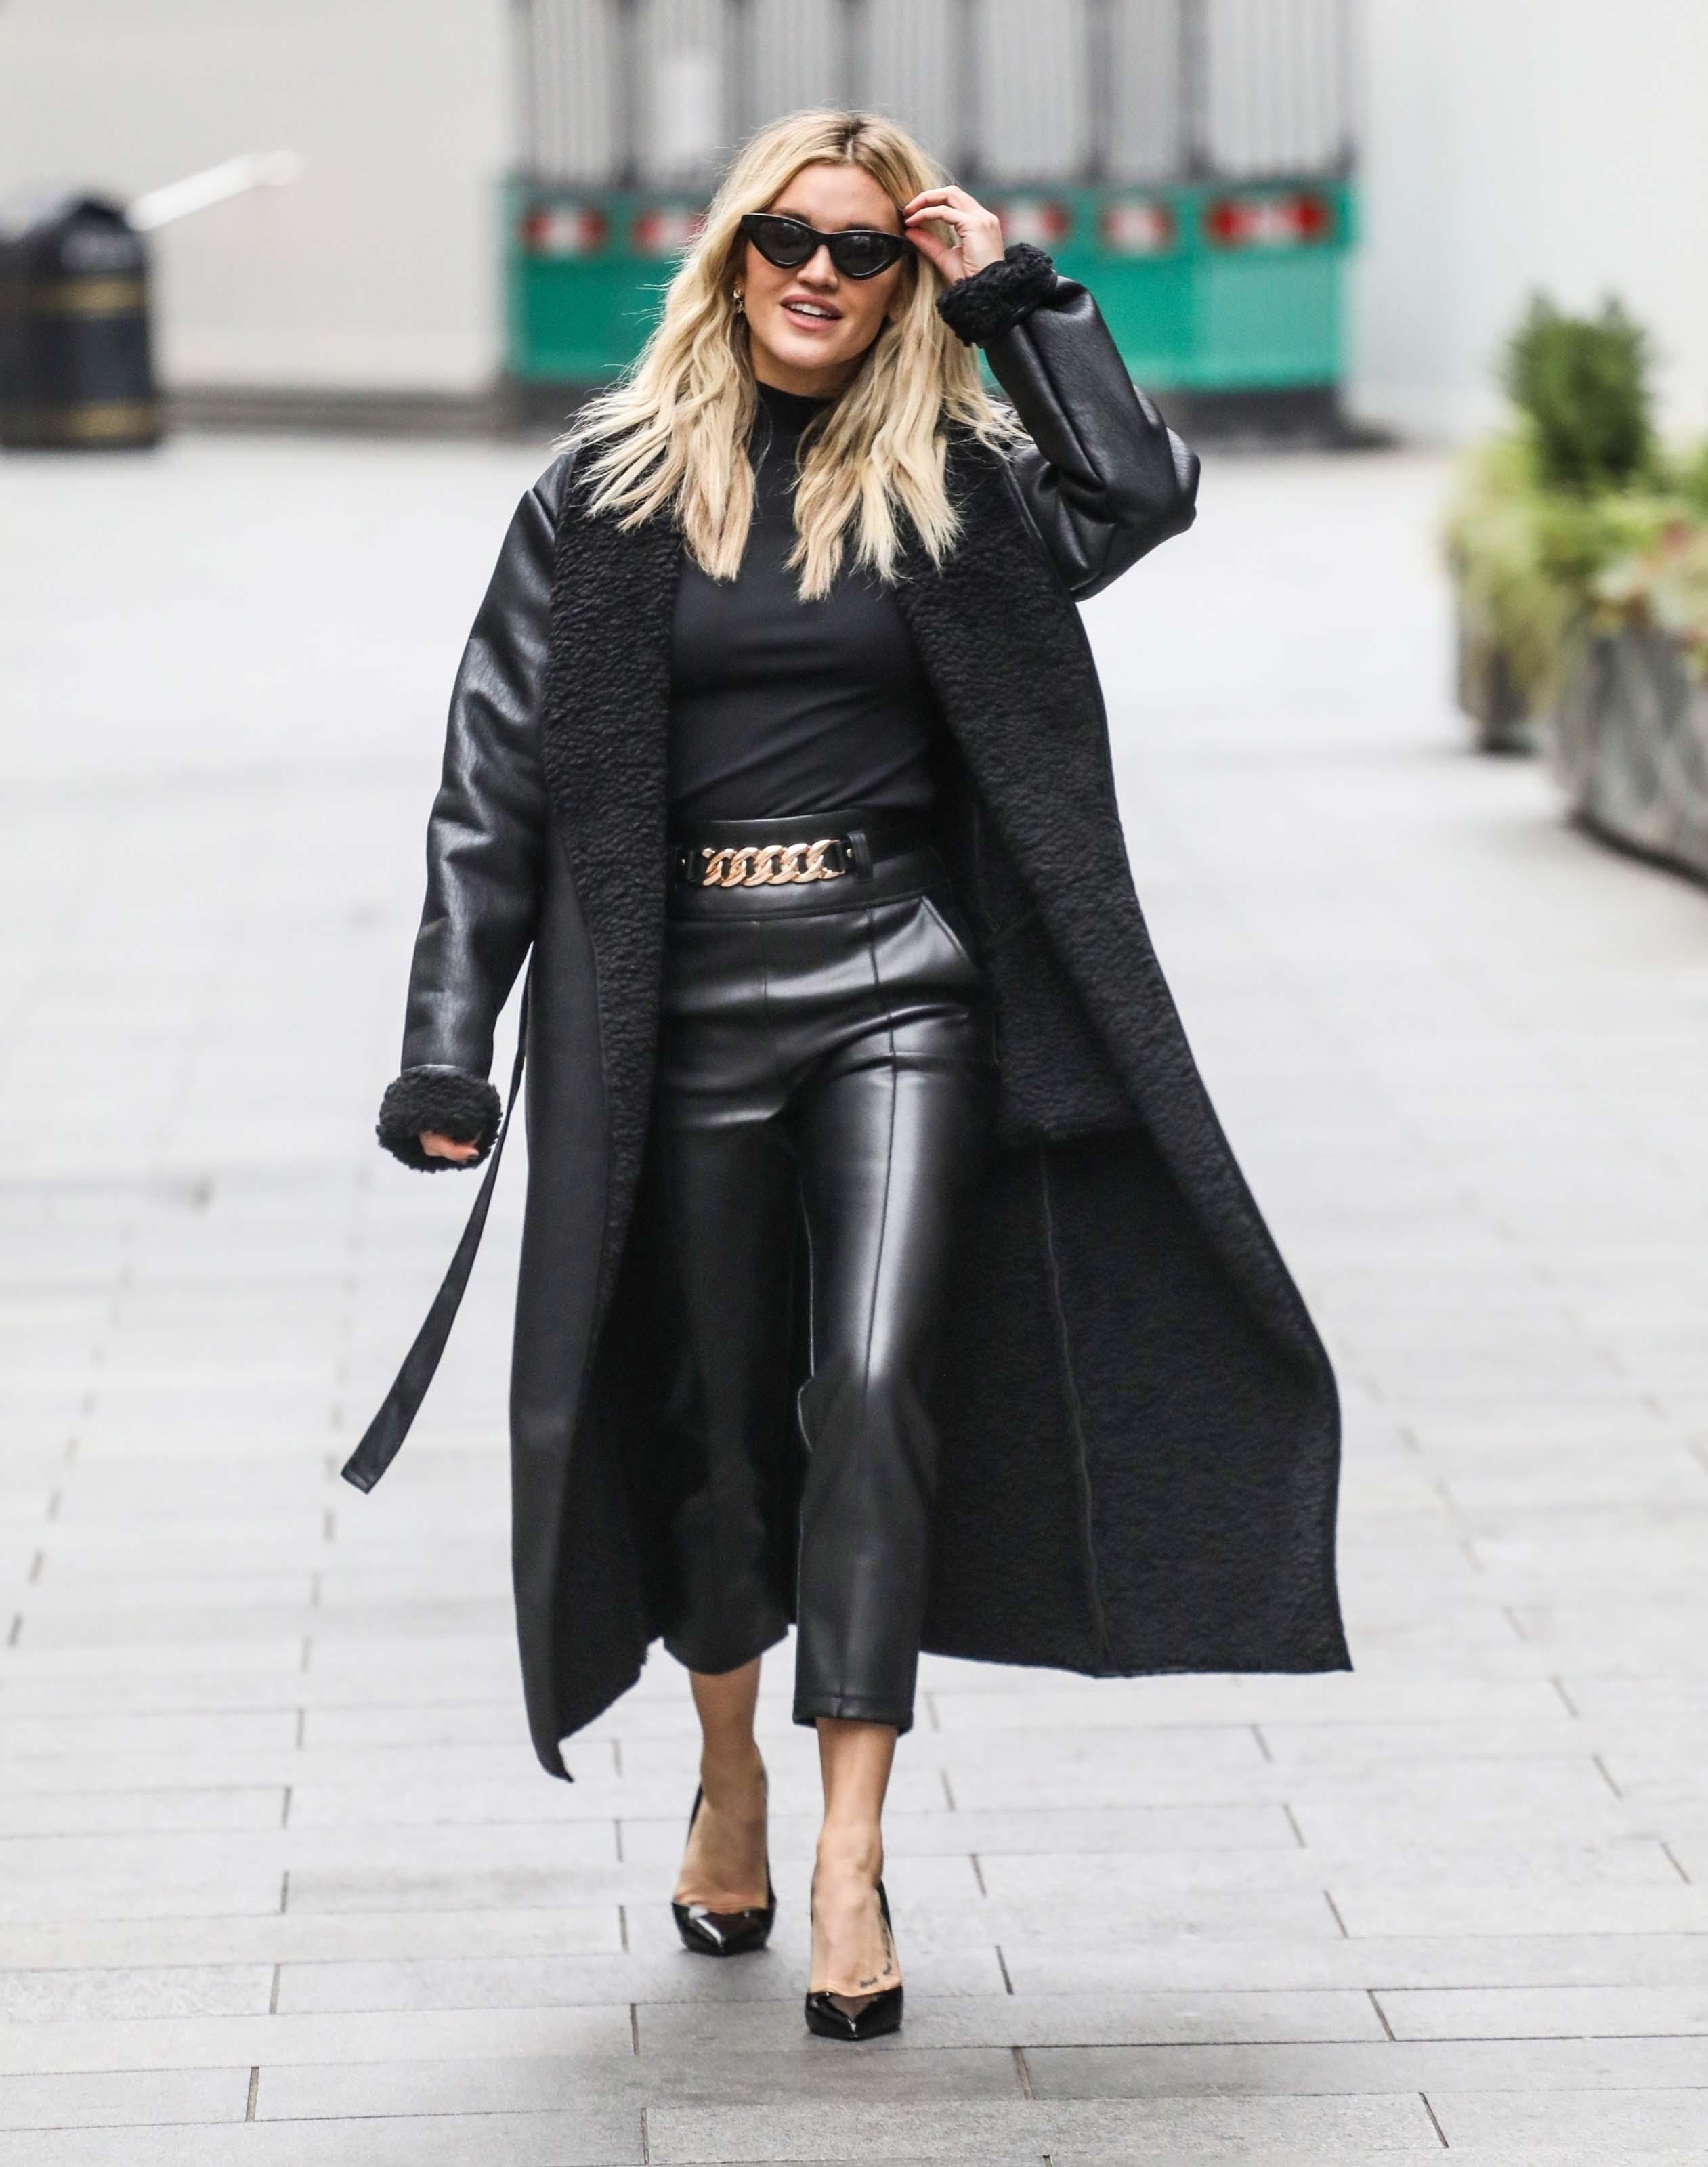 Ashley Roberts leaving Global Studios in London